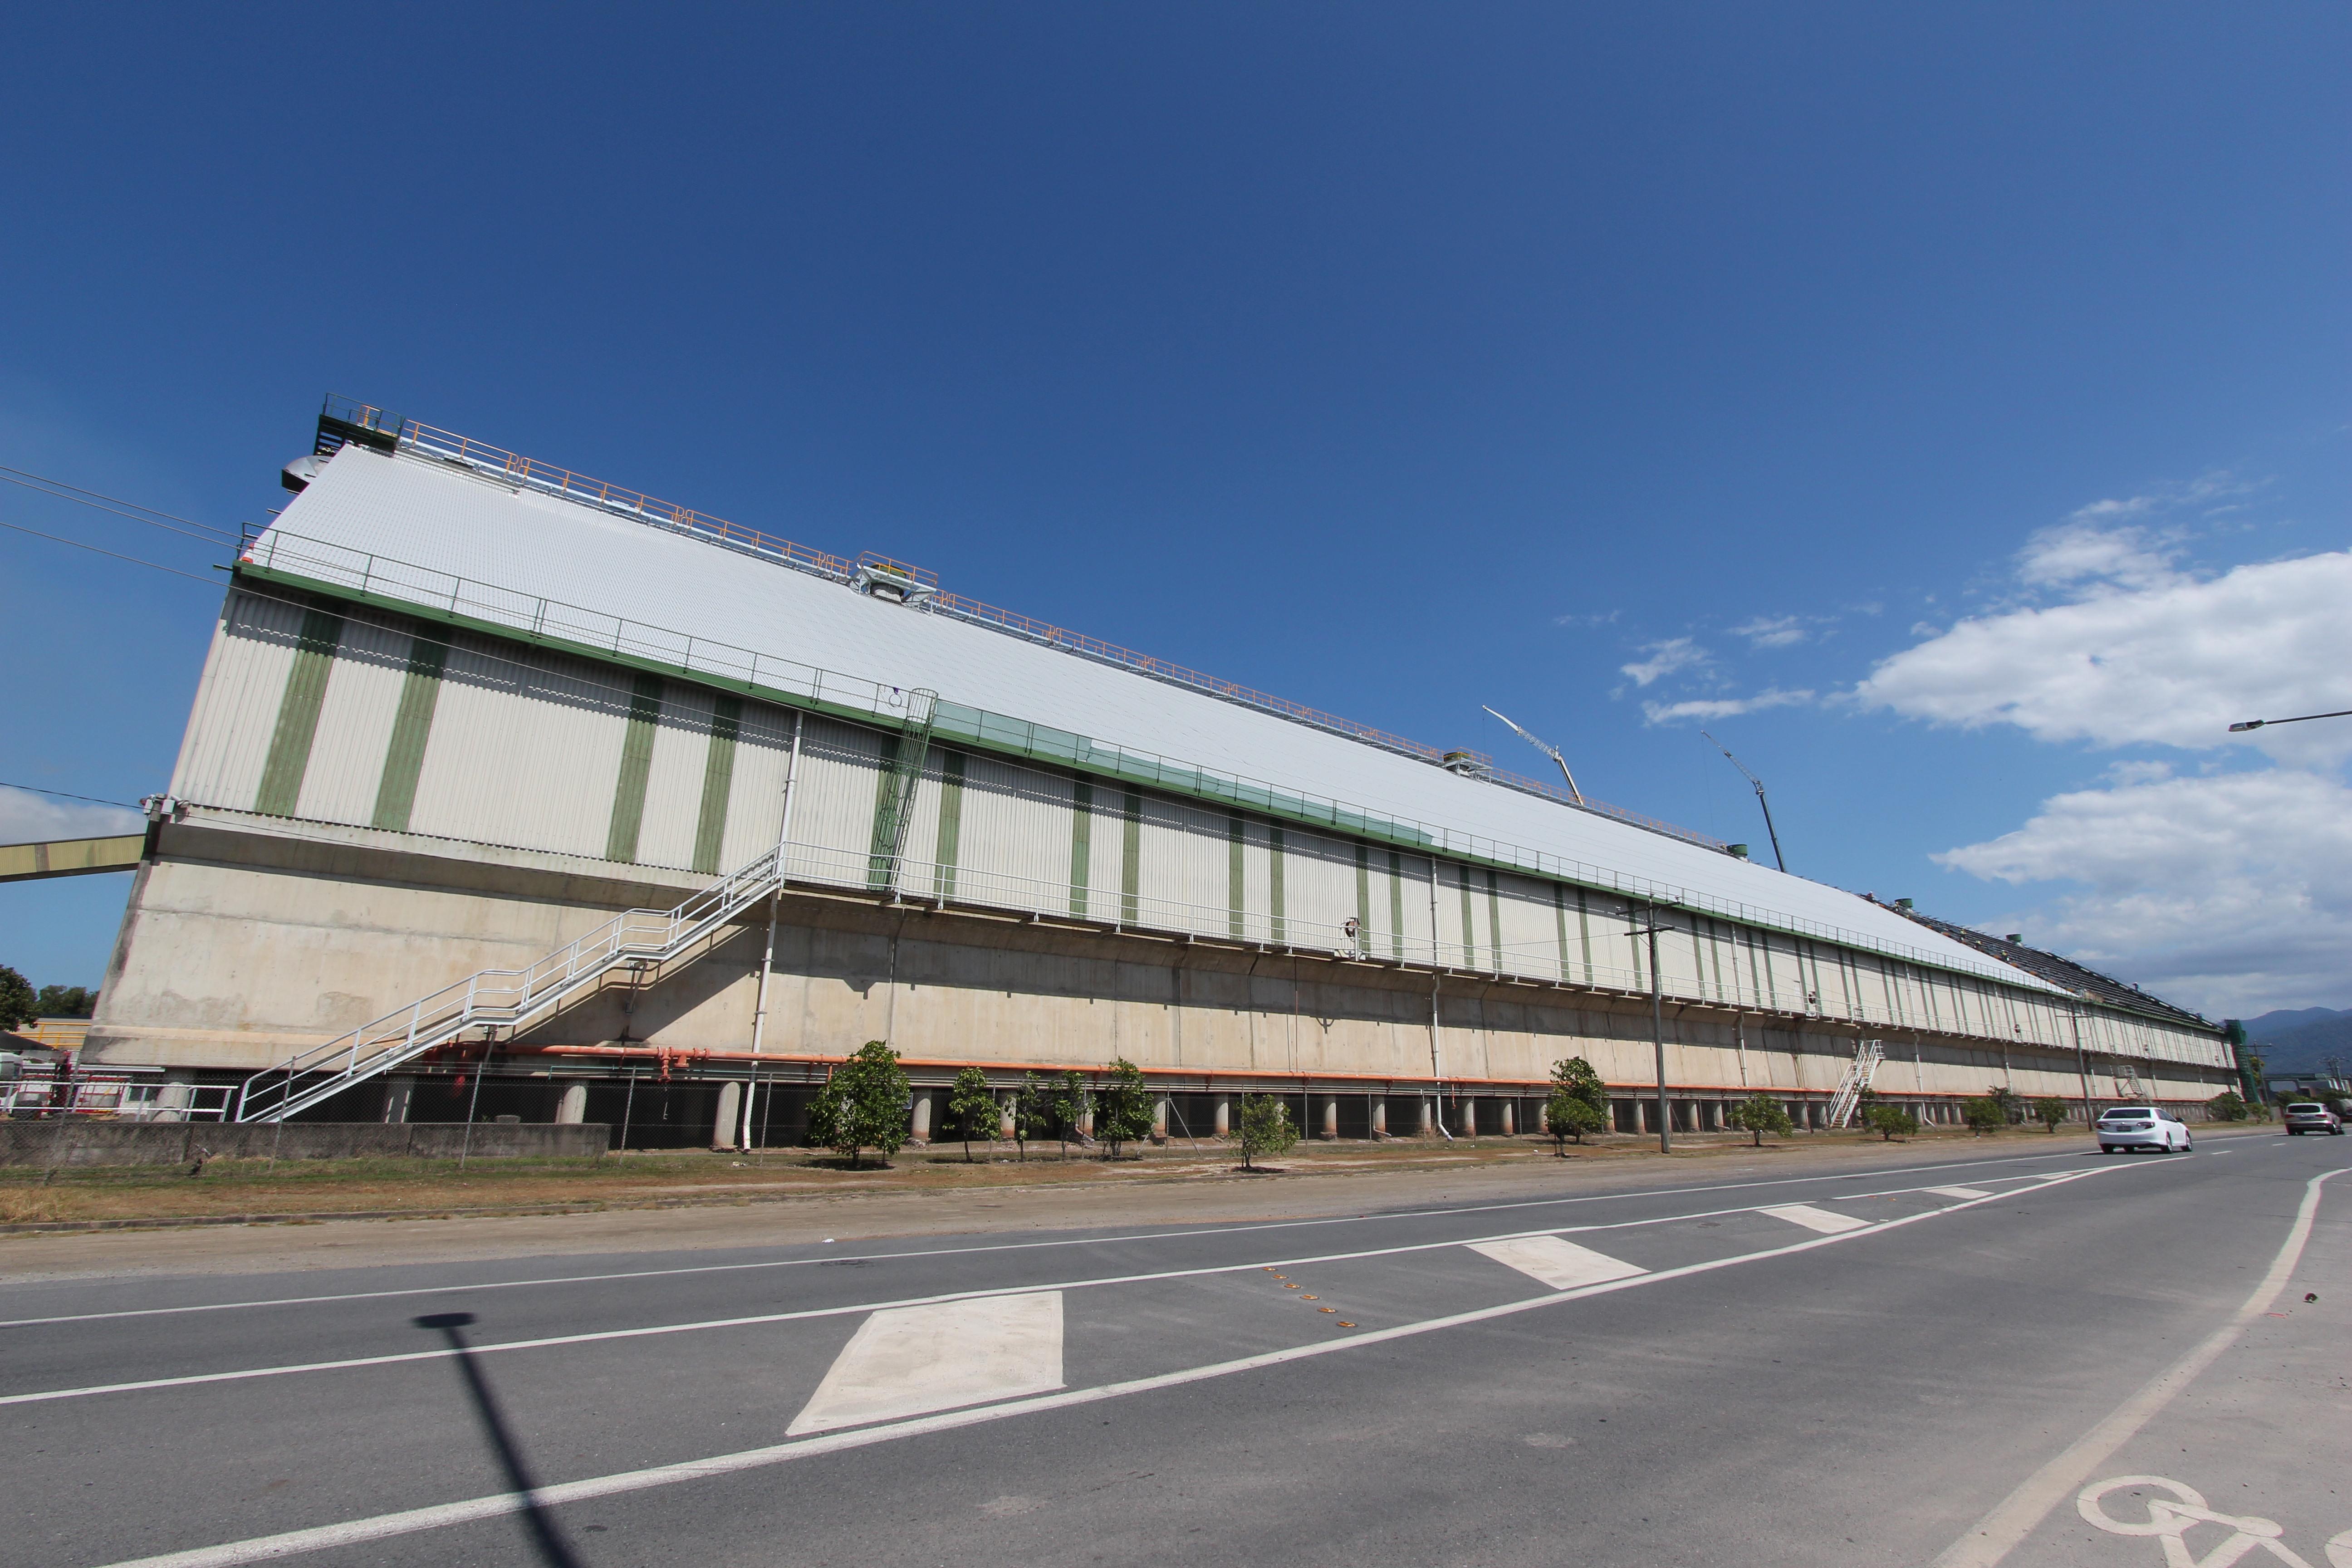 Queensland Industrial Cladding